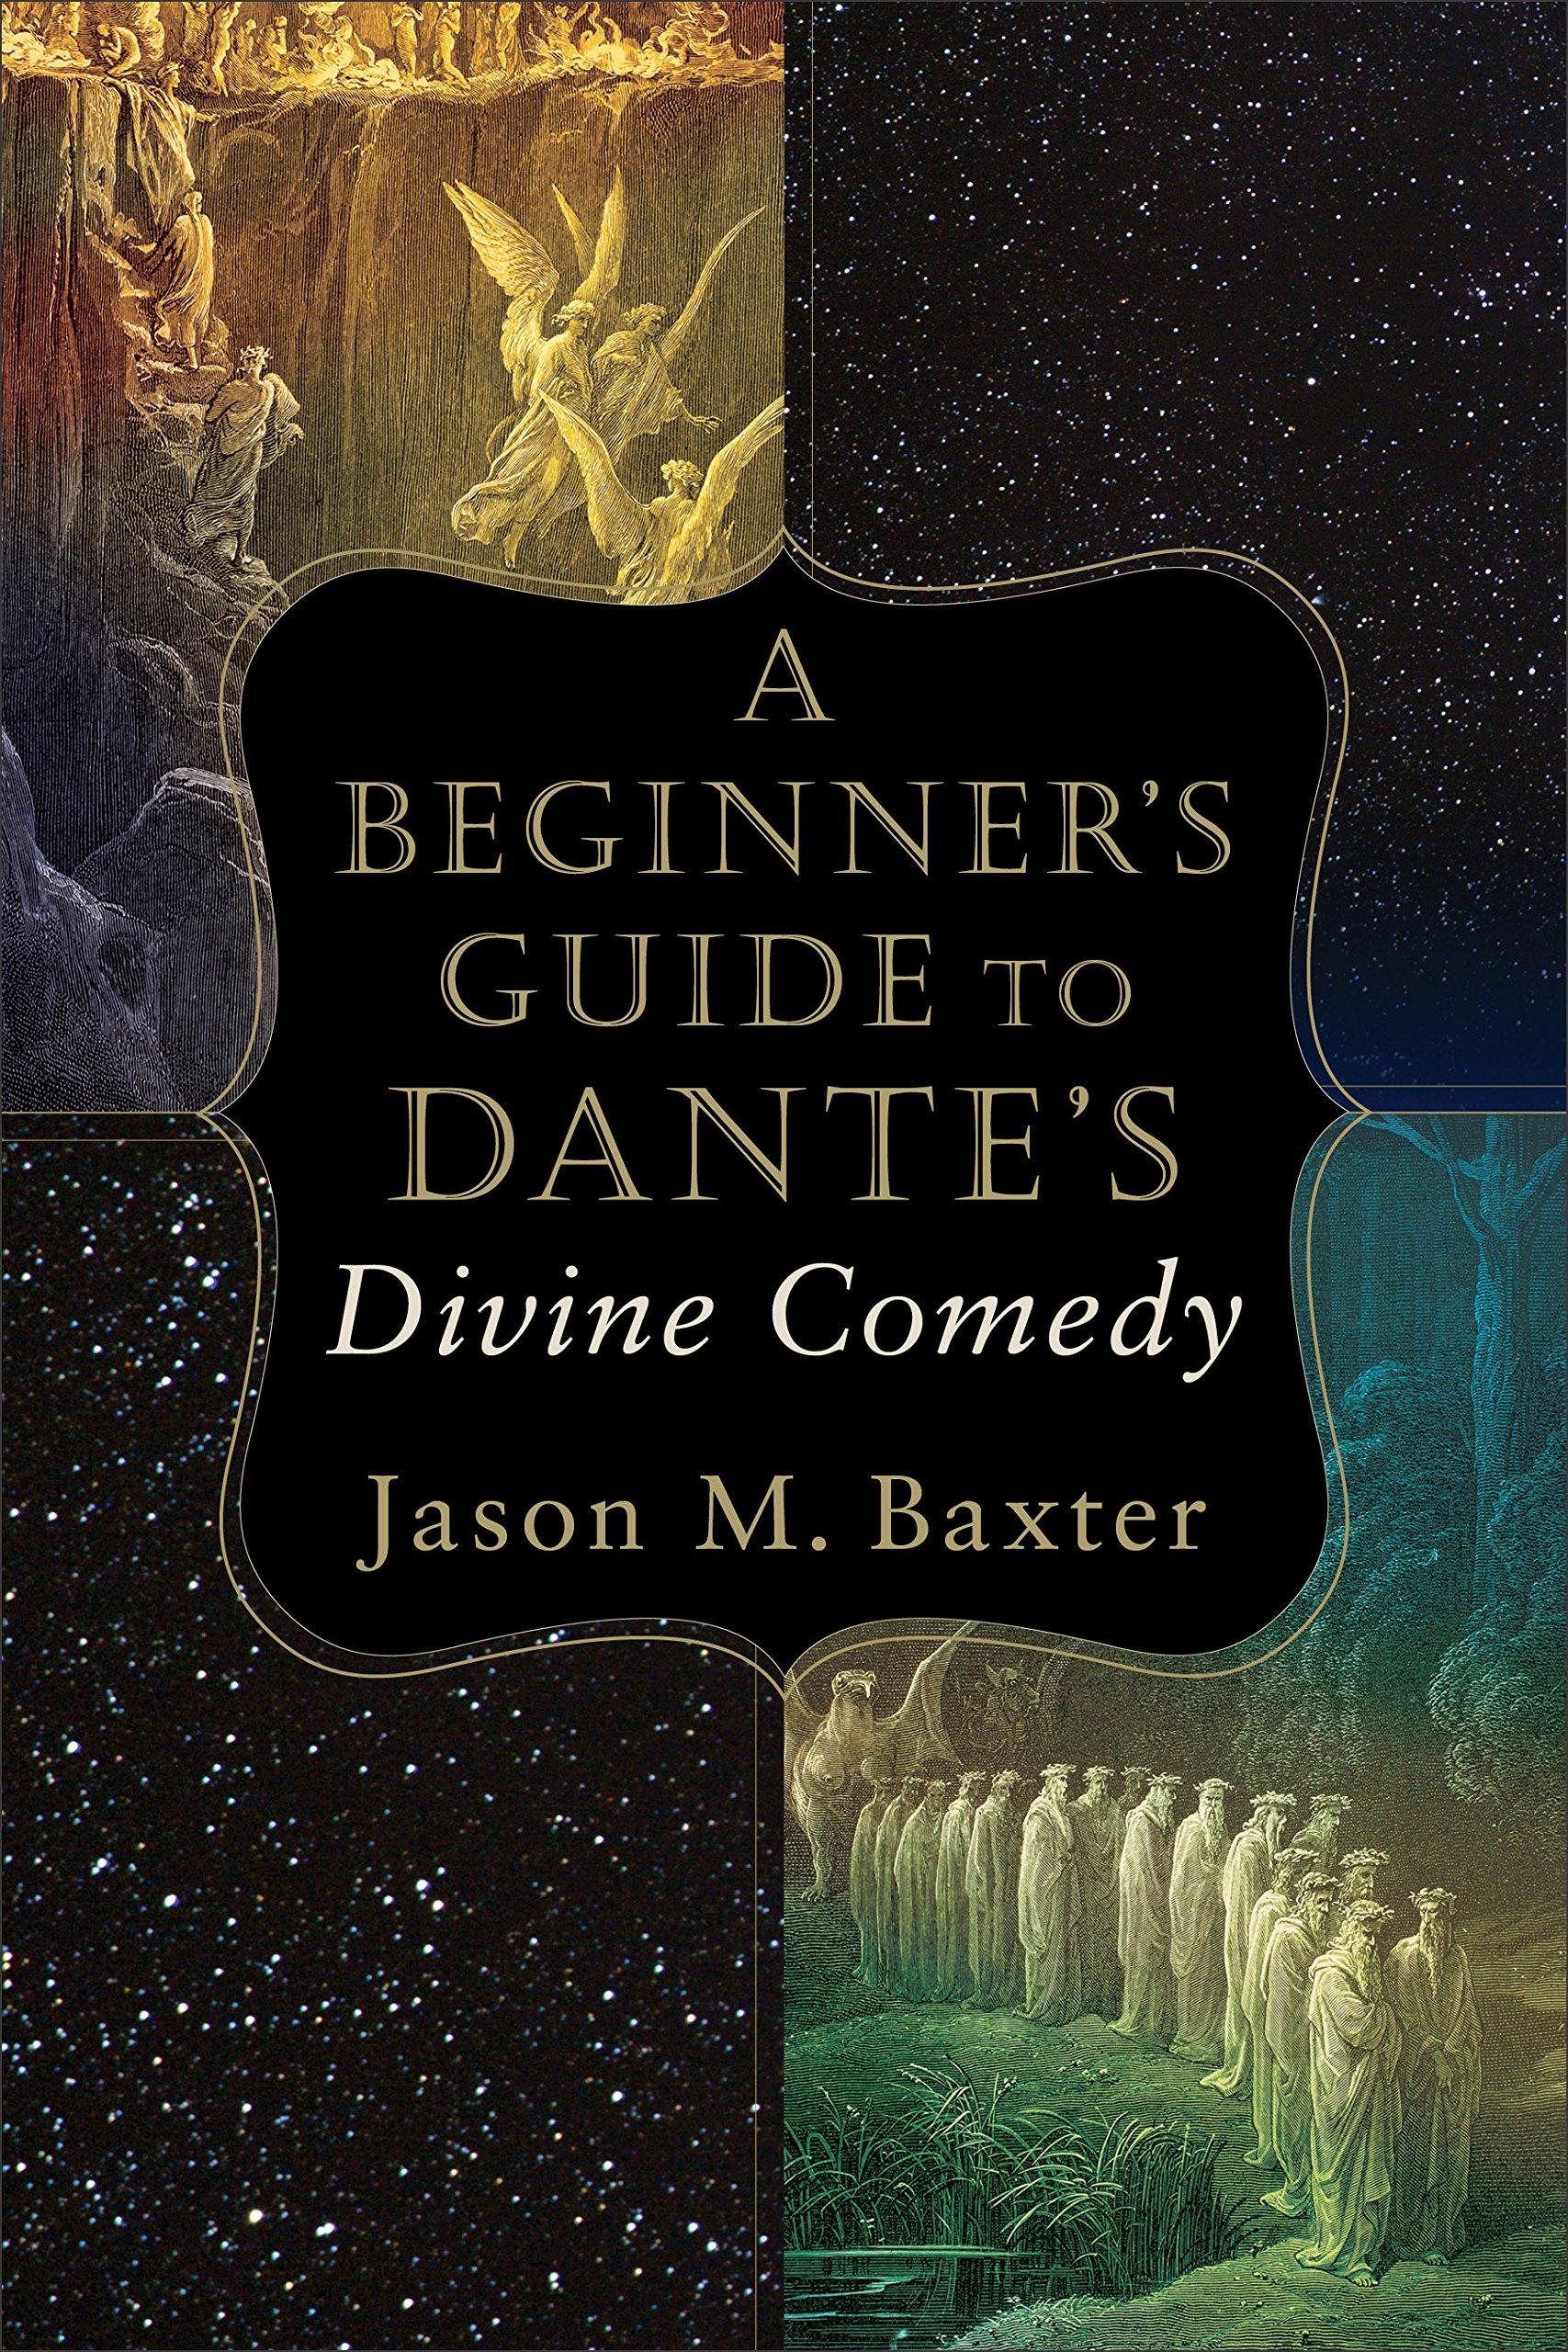 A Beginner's Guide to Dante's Divine Comedy (English Edition)